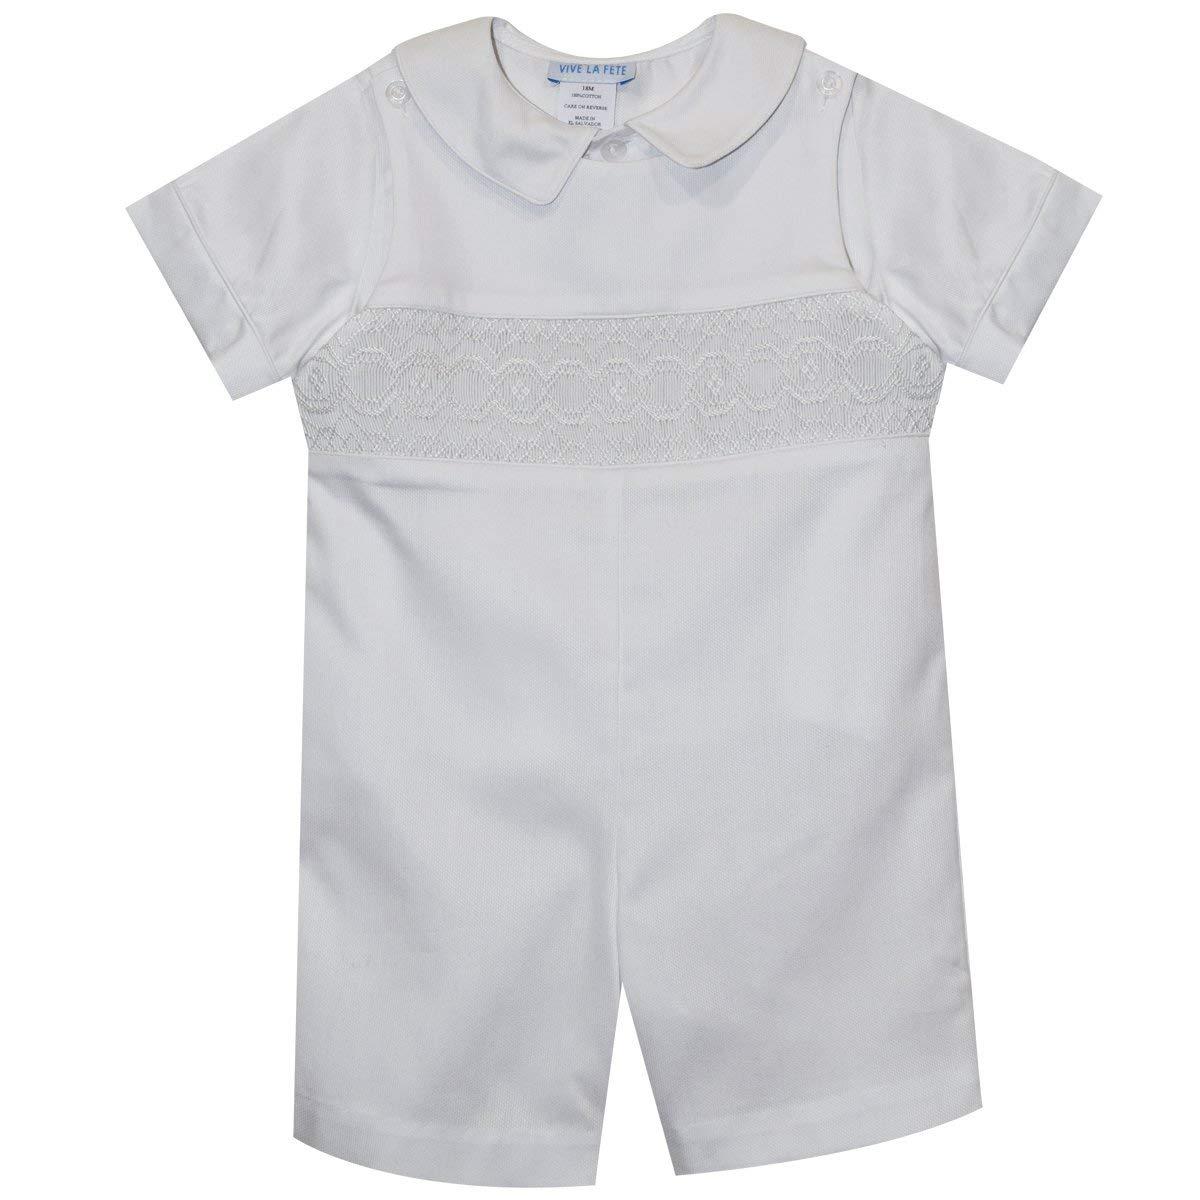 Vive La Fete Geometric Smocked White Pique Boys Shortall Short Sleeve